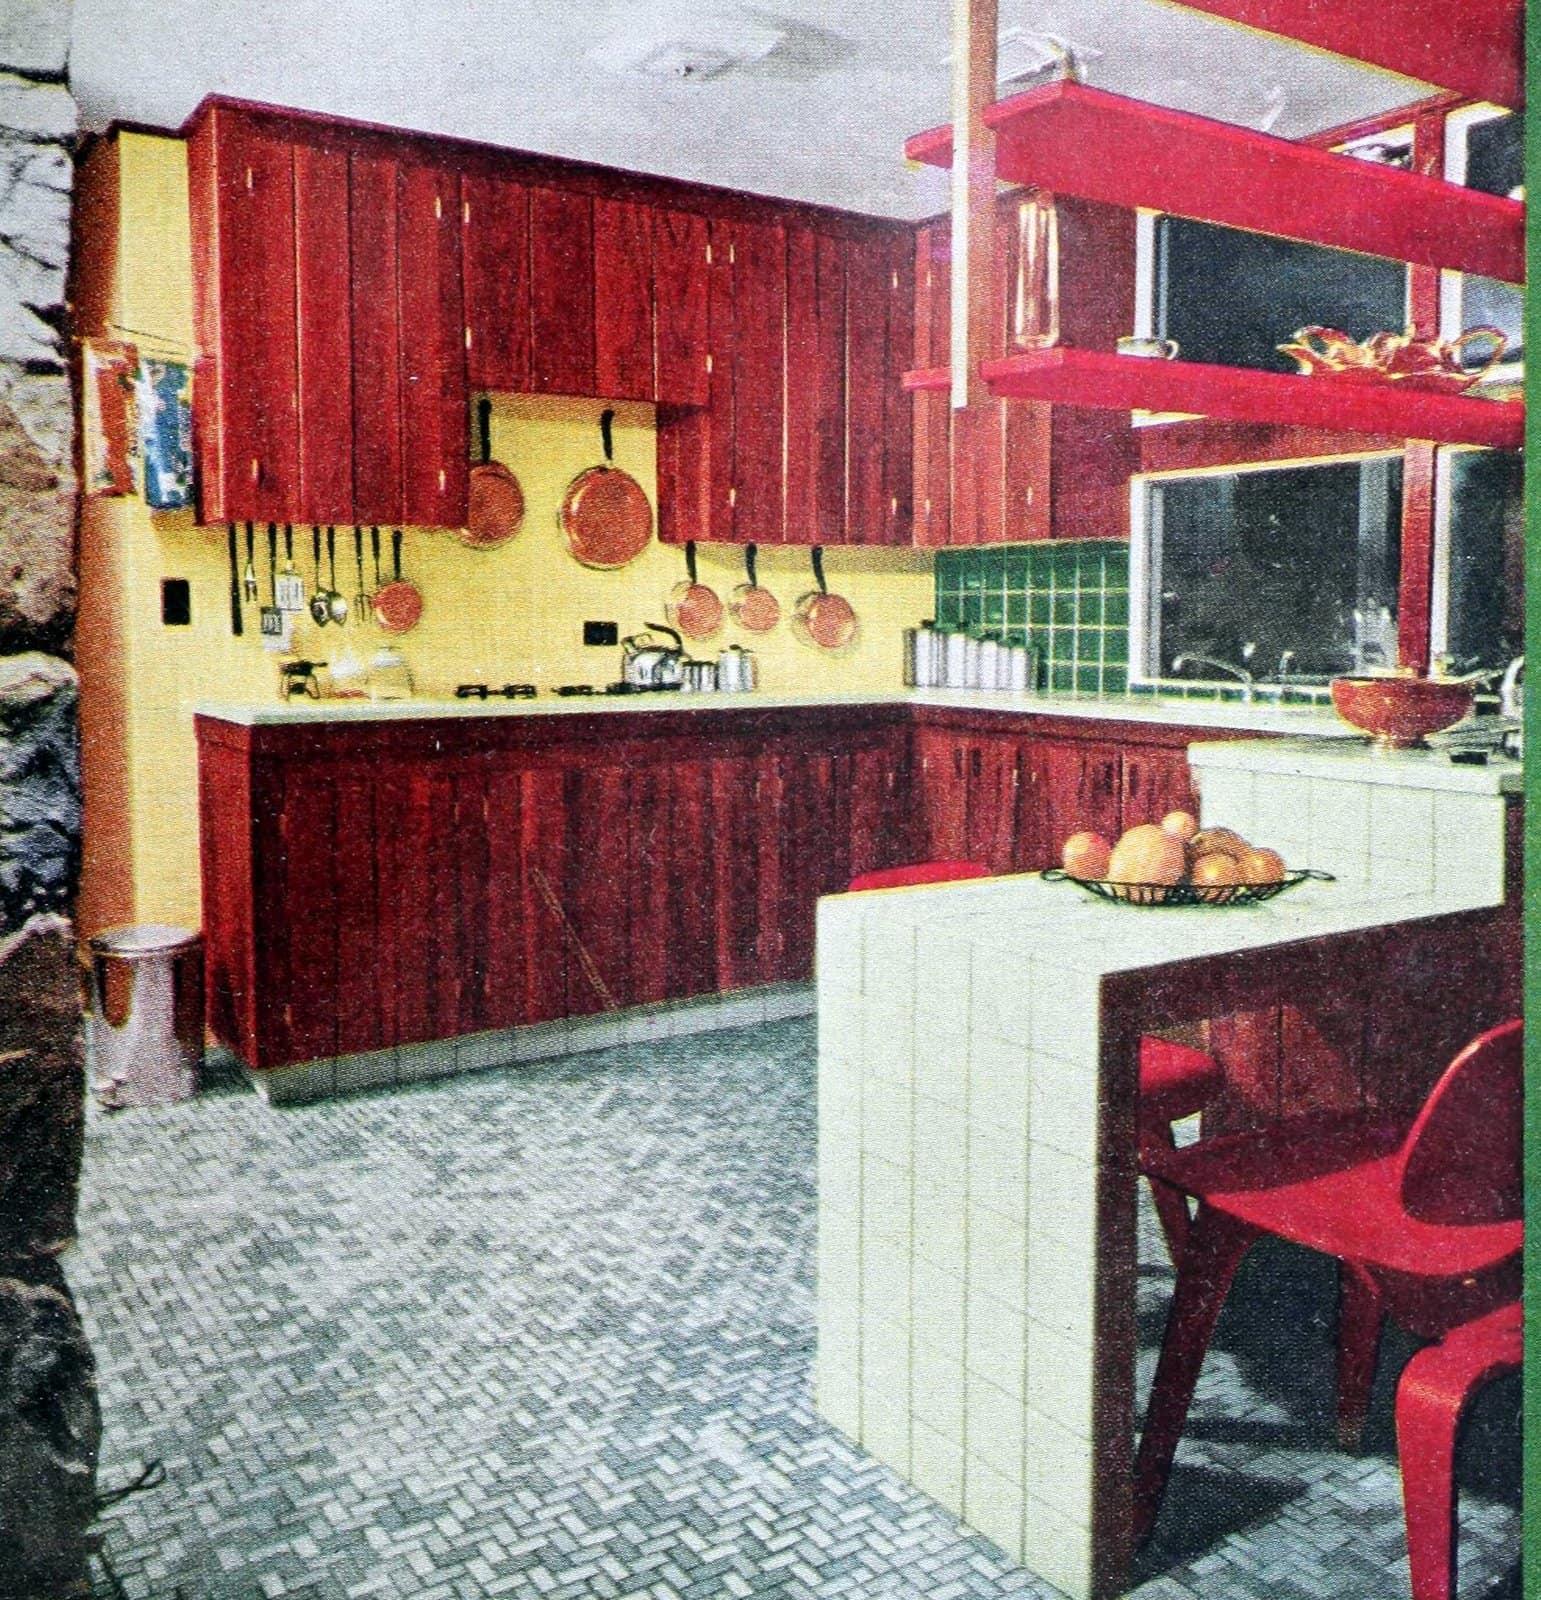 Retro 1955 kitchen design with ceramic tile surfaces